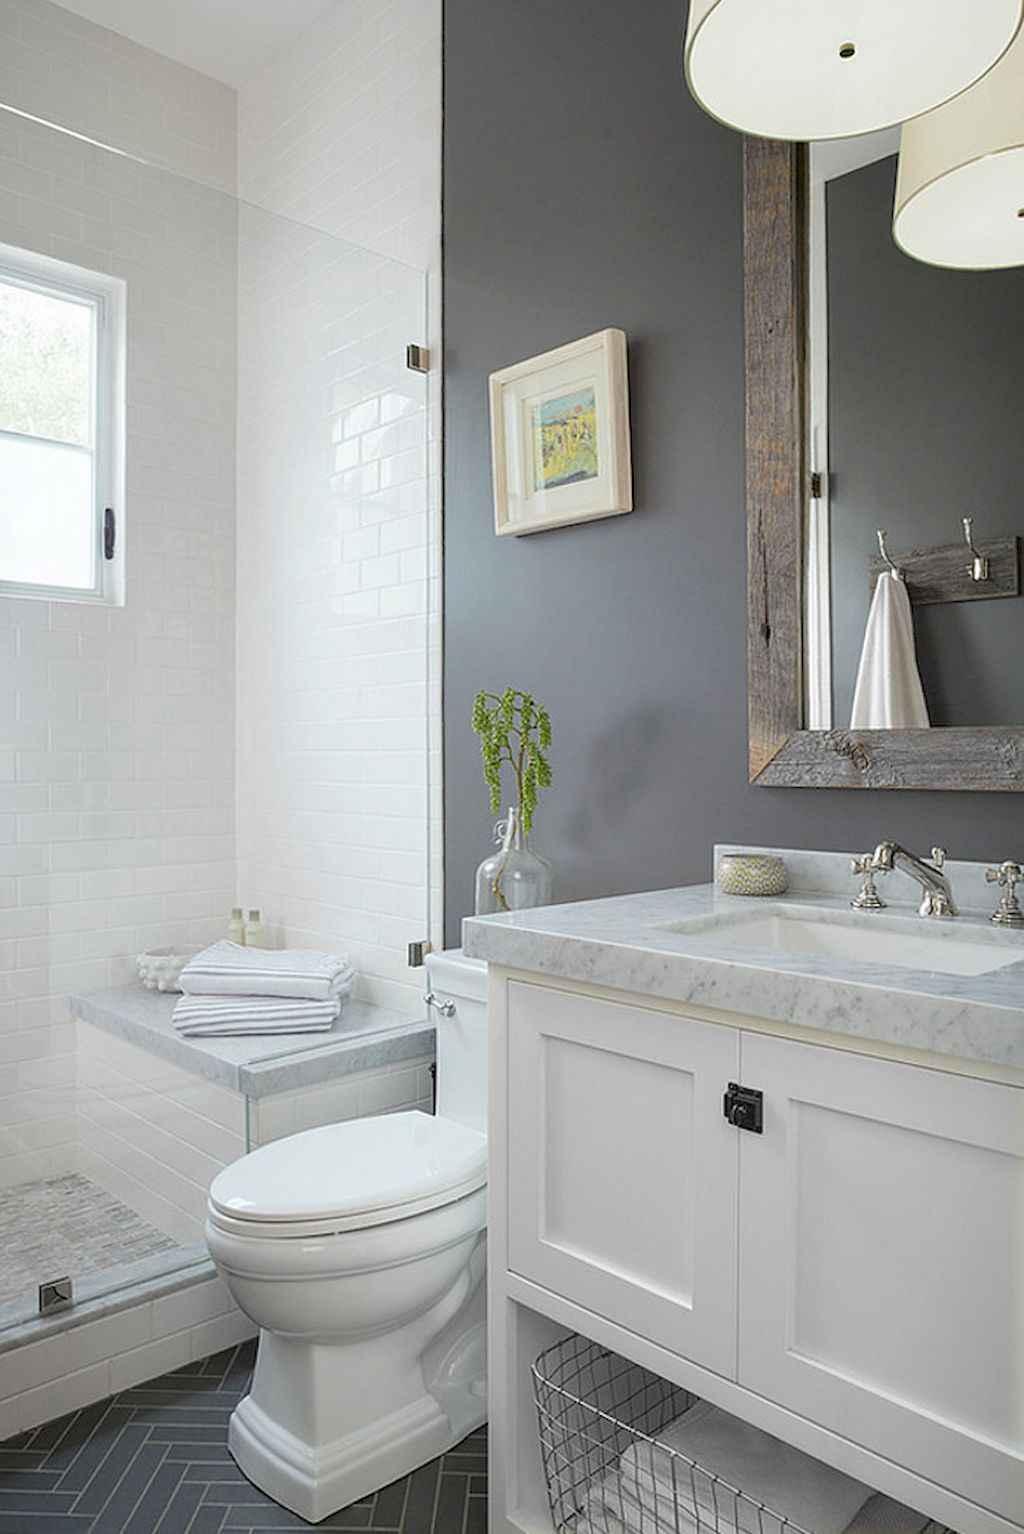 Inspiring apartment bathroom remodel ideas on a budget (18)